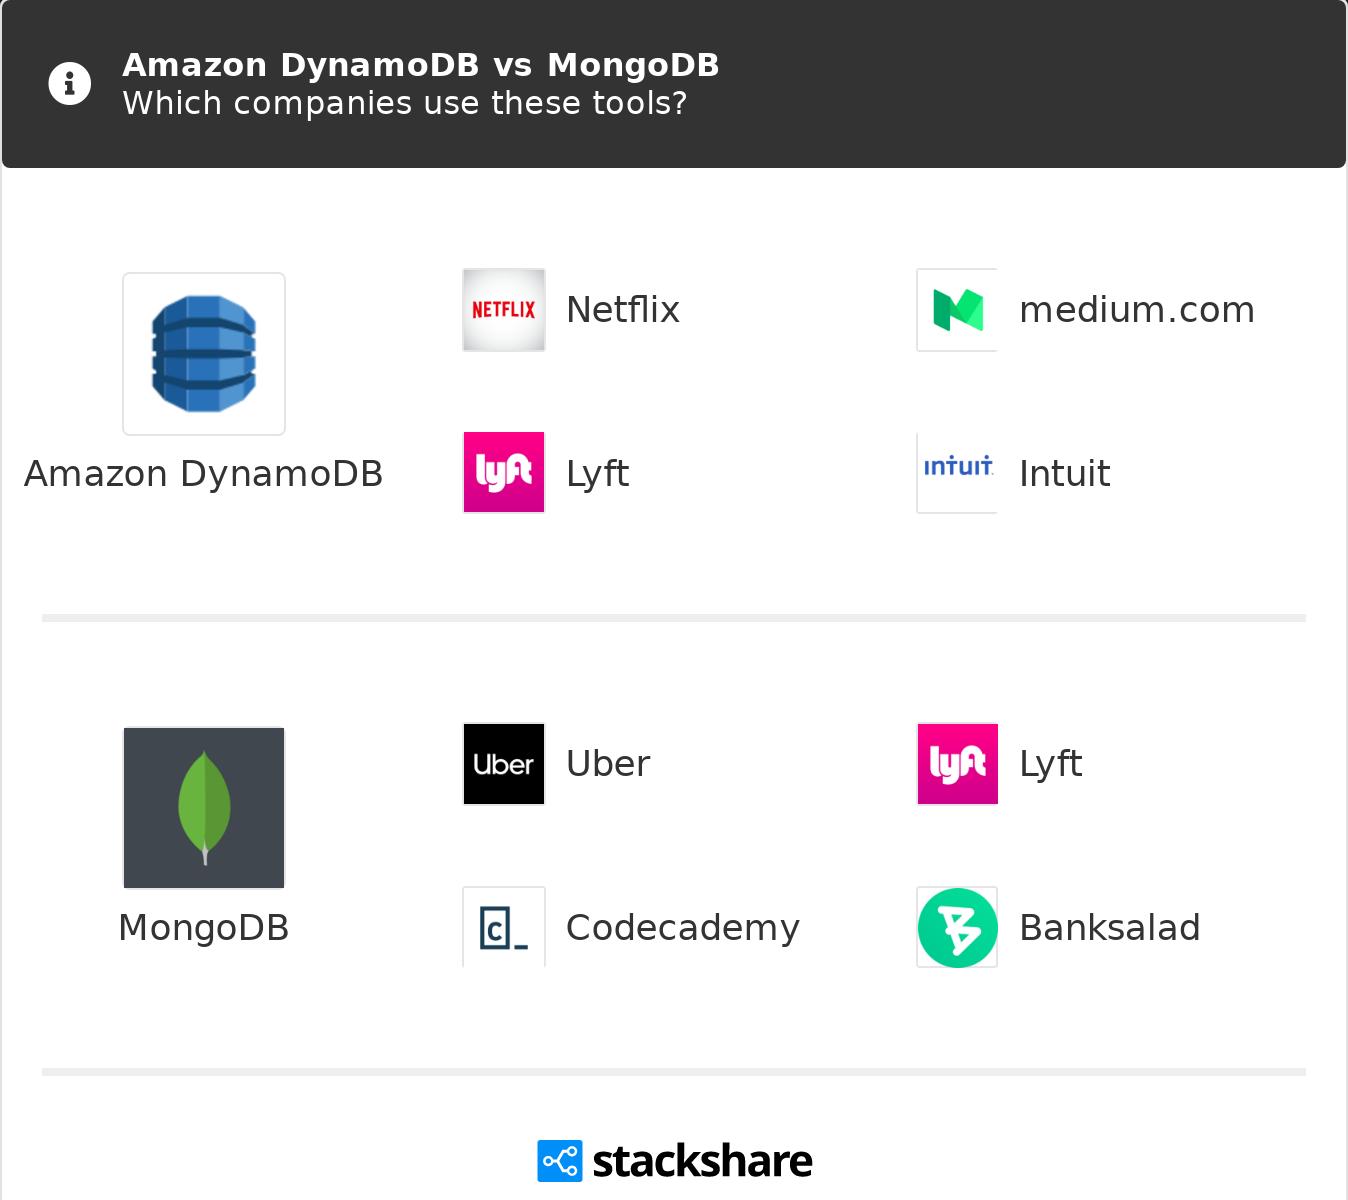 Amazon DynamoDB vs MongoDB | What are the differences?